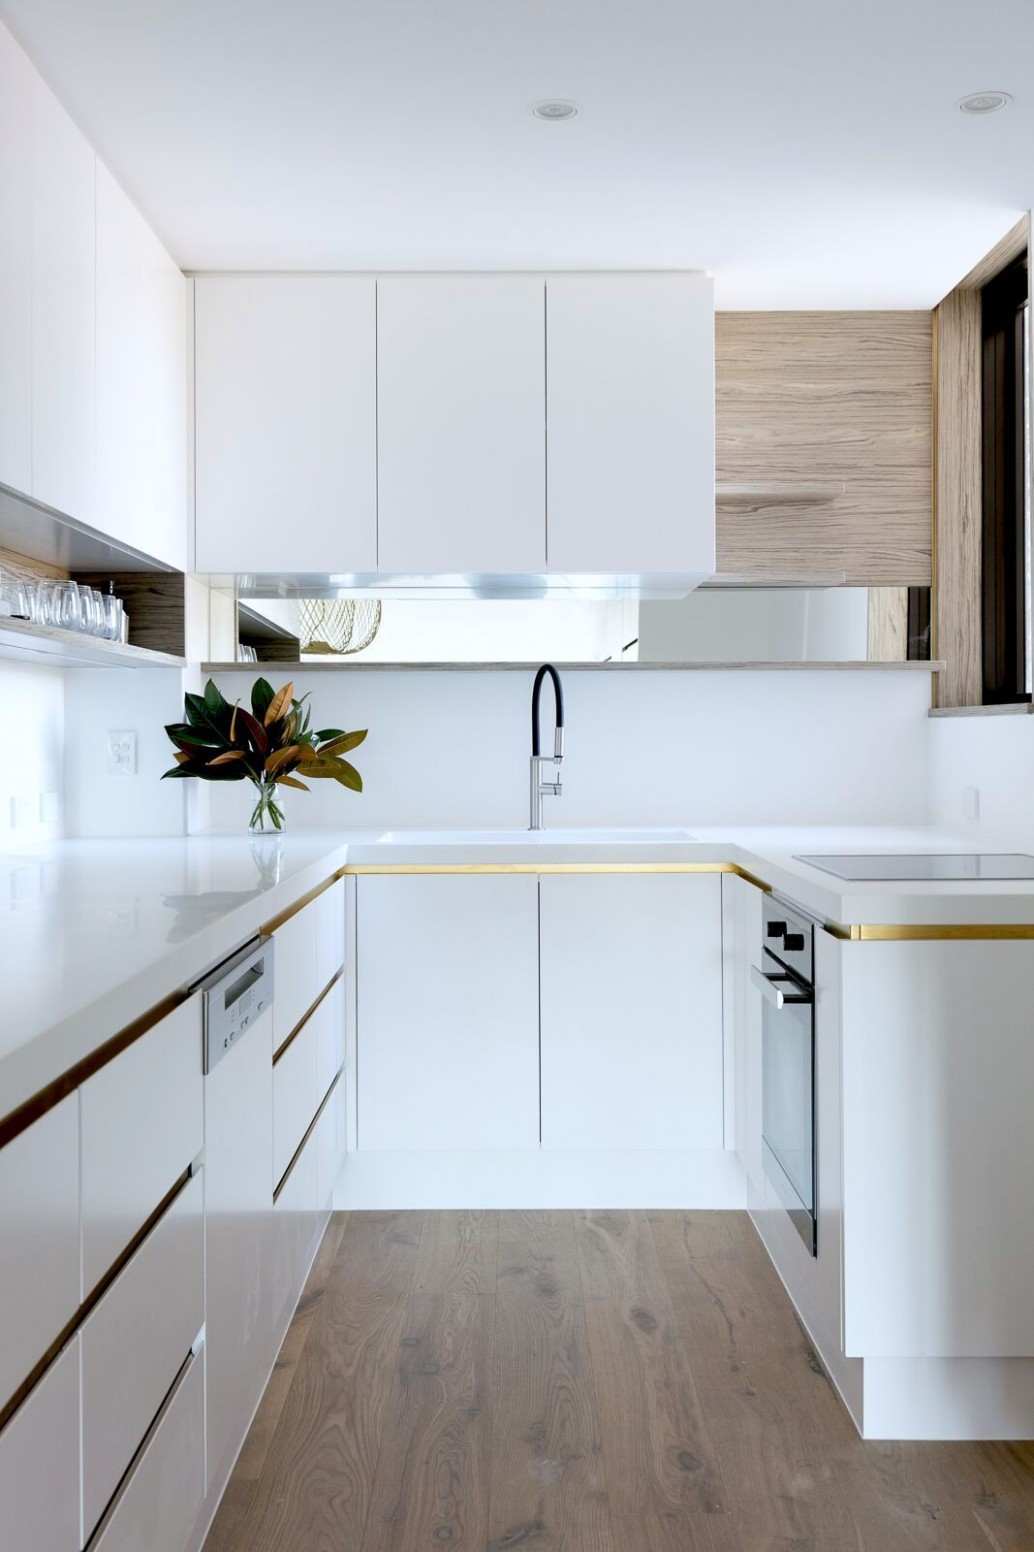 Sydney Harbour View · Jillian Dinkel · Interior Design & Styling  - Apartment Kitchen Design Sydney